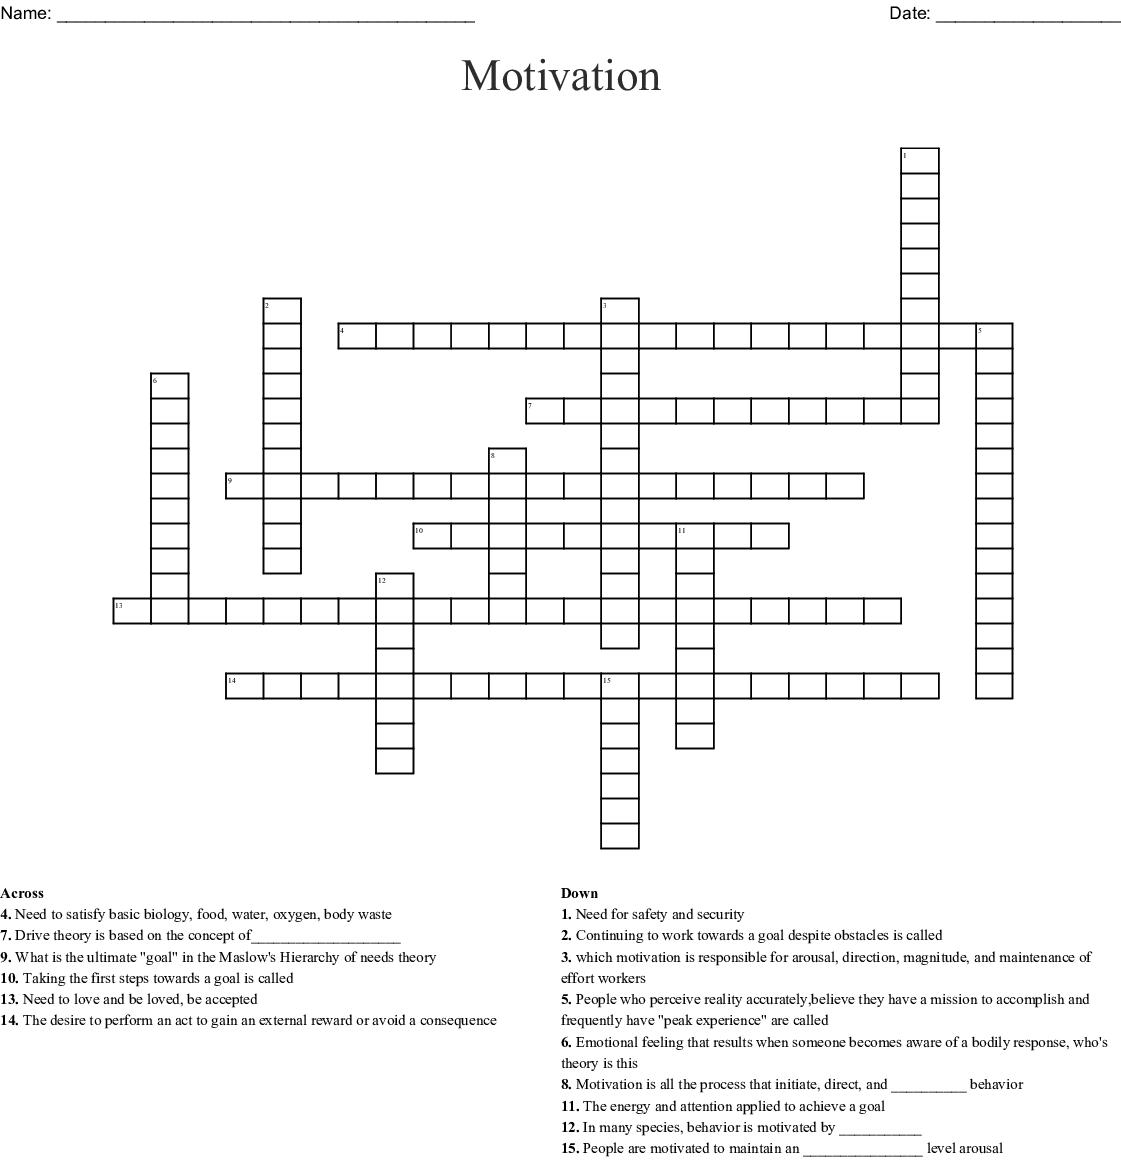 Motivation Crossword